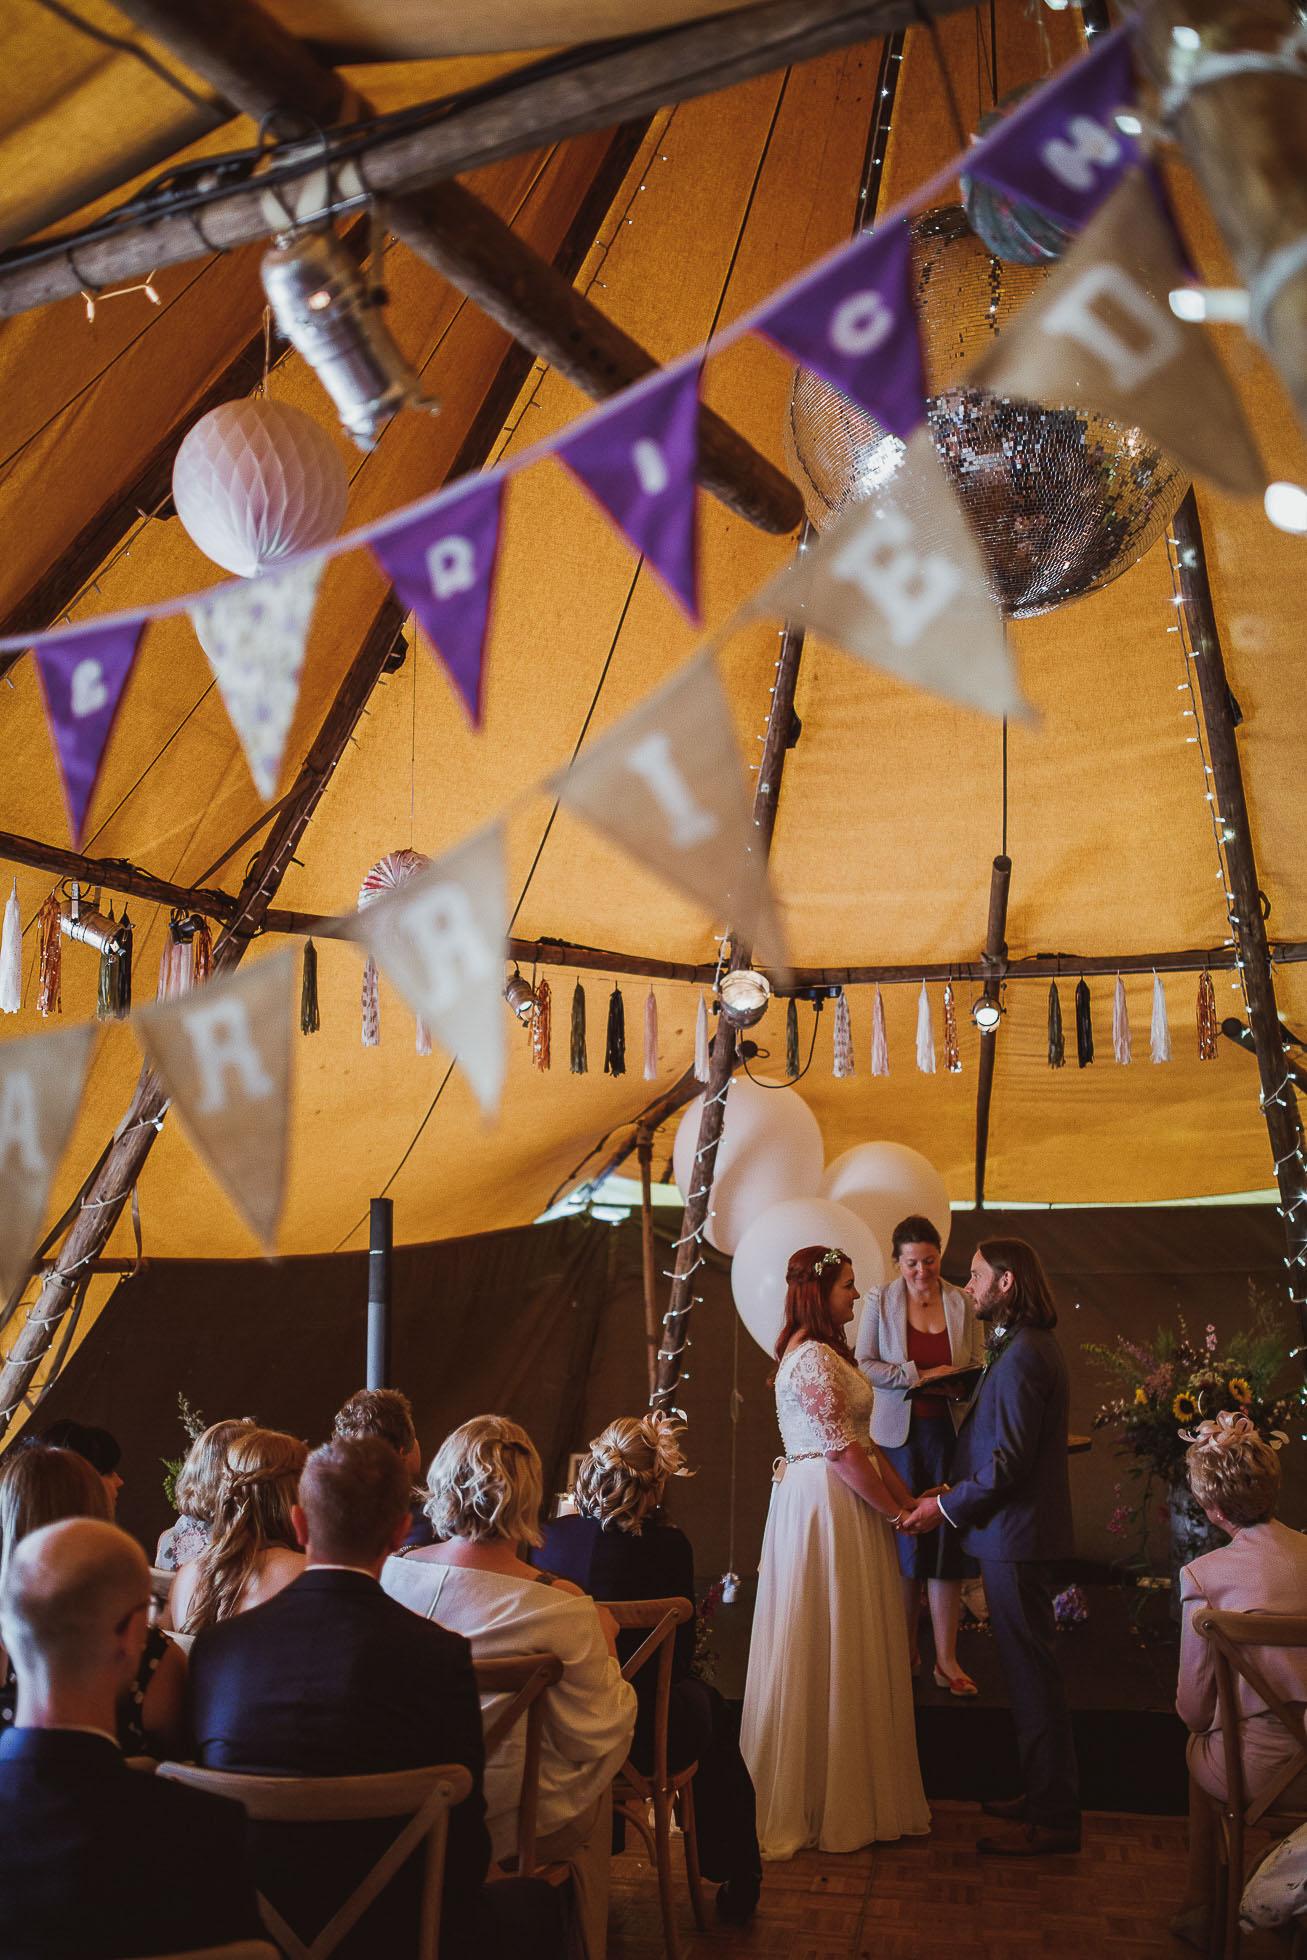 skipbridge_farm_wedding_york-49.jpg